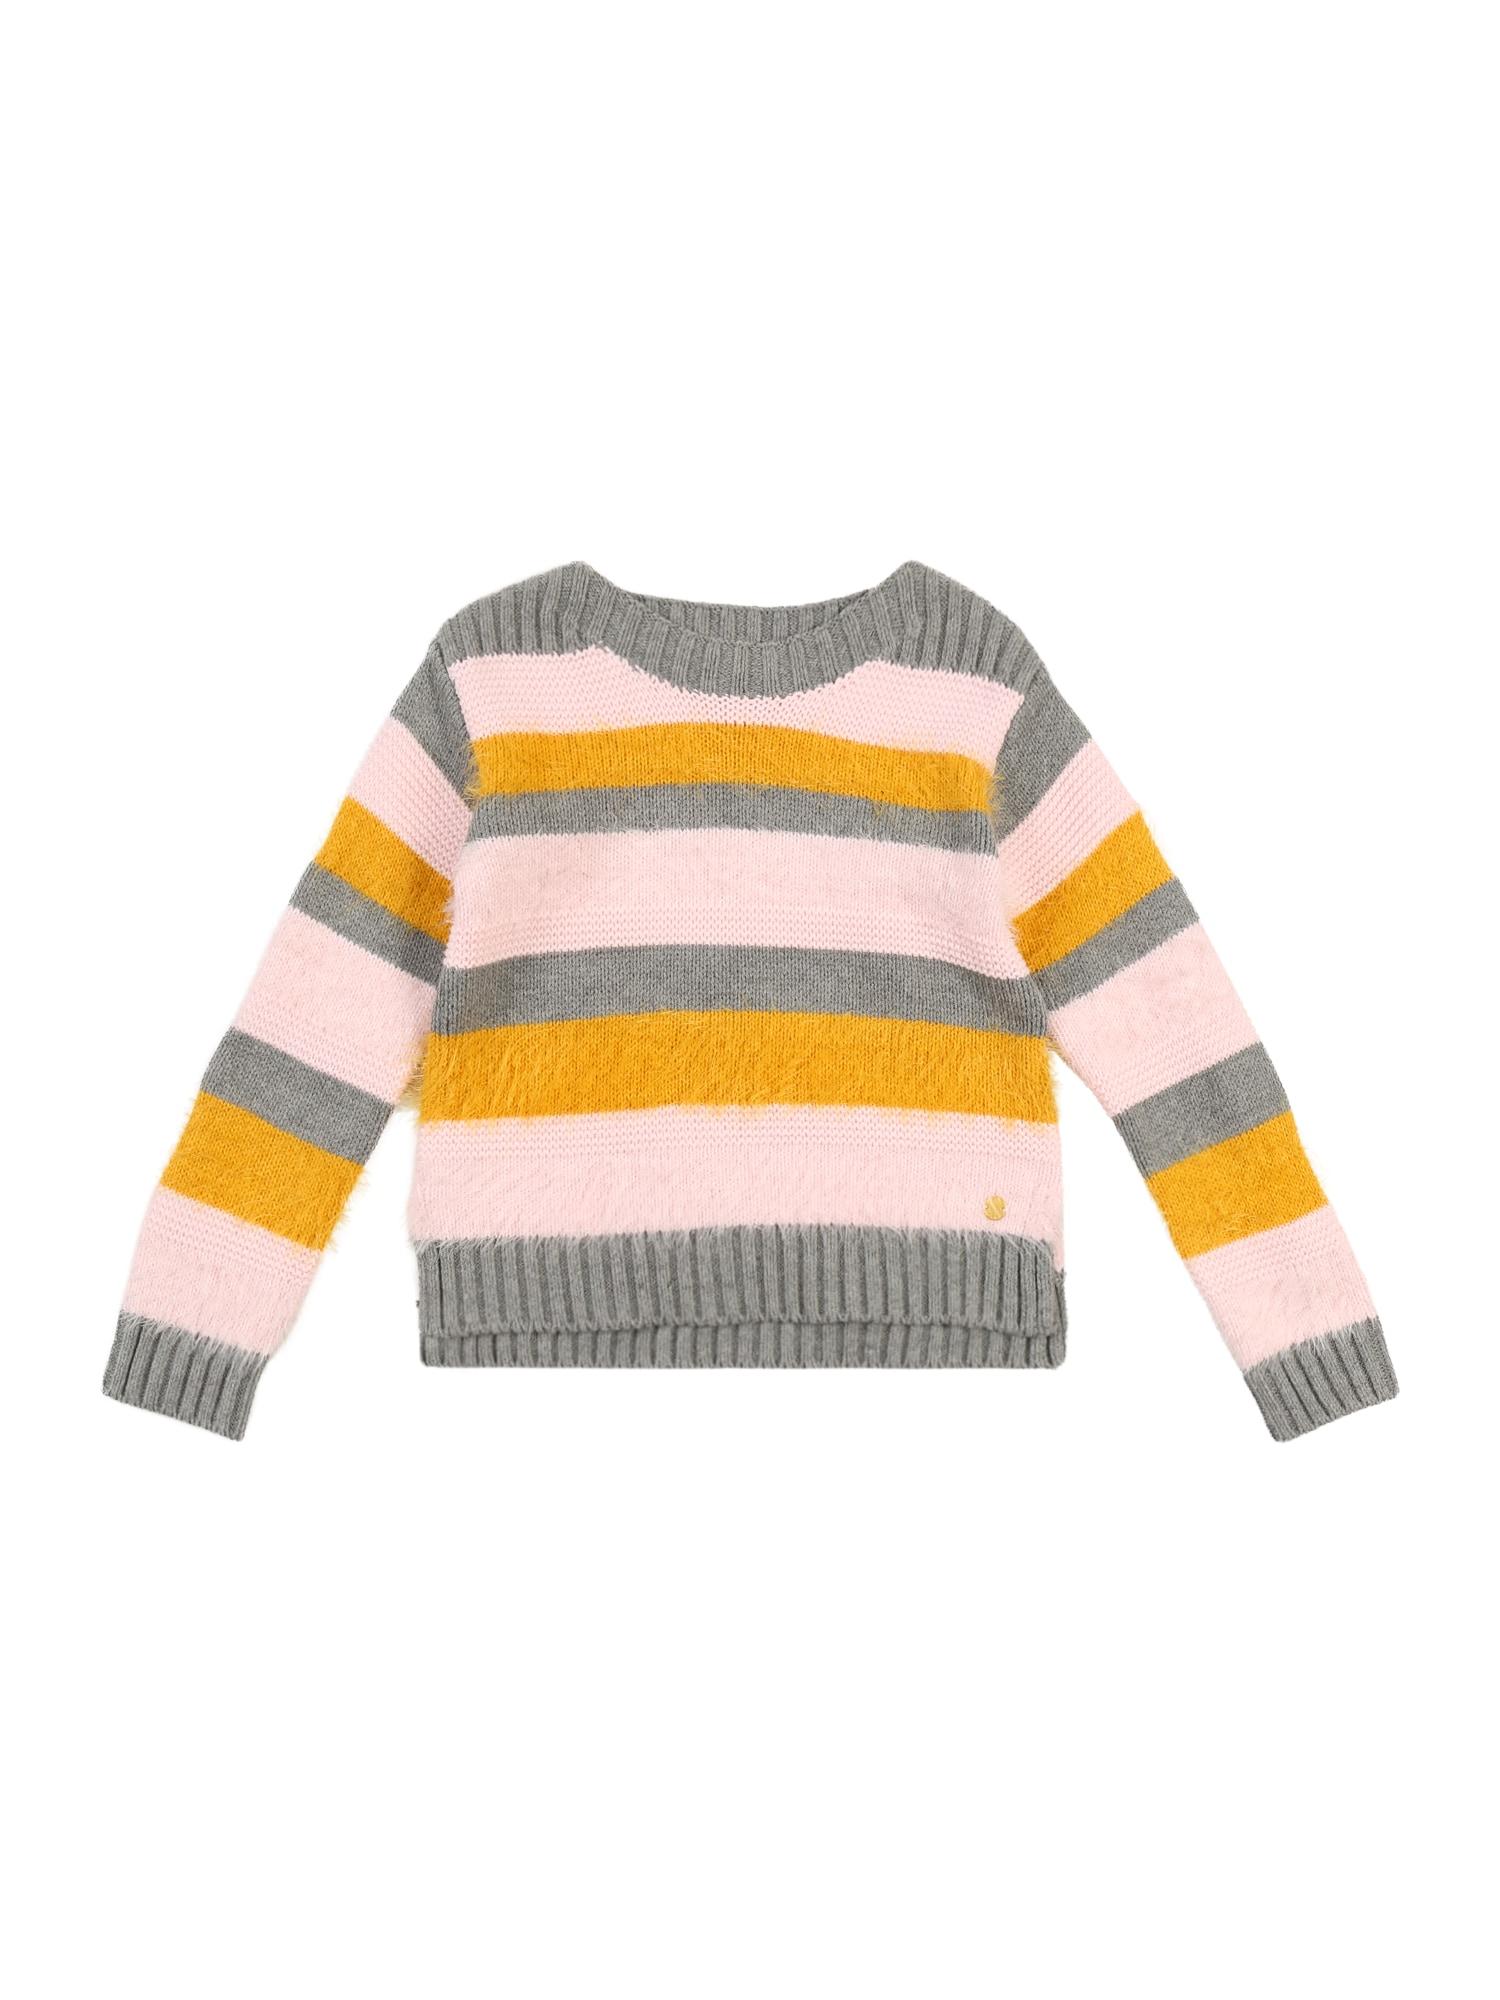 ESPRIT Megztinis 'PULLI' geltona / pilka / rožių spalva